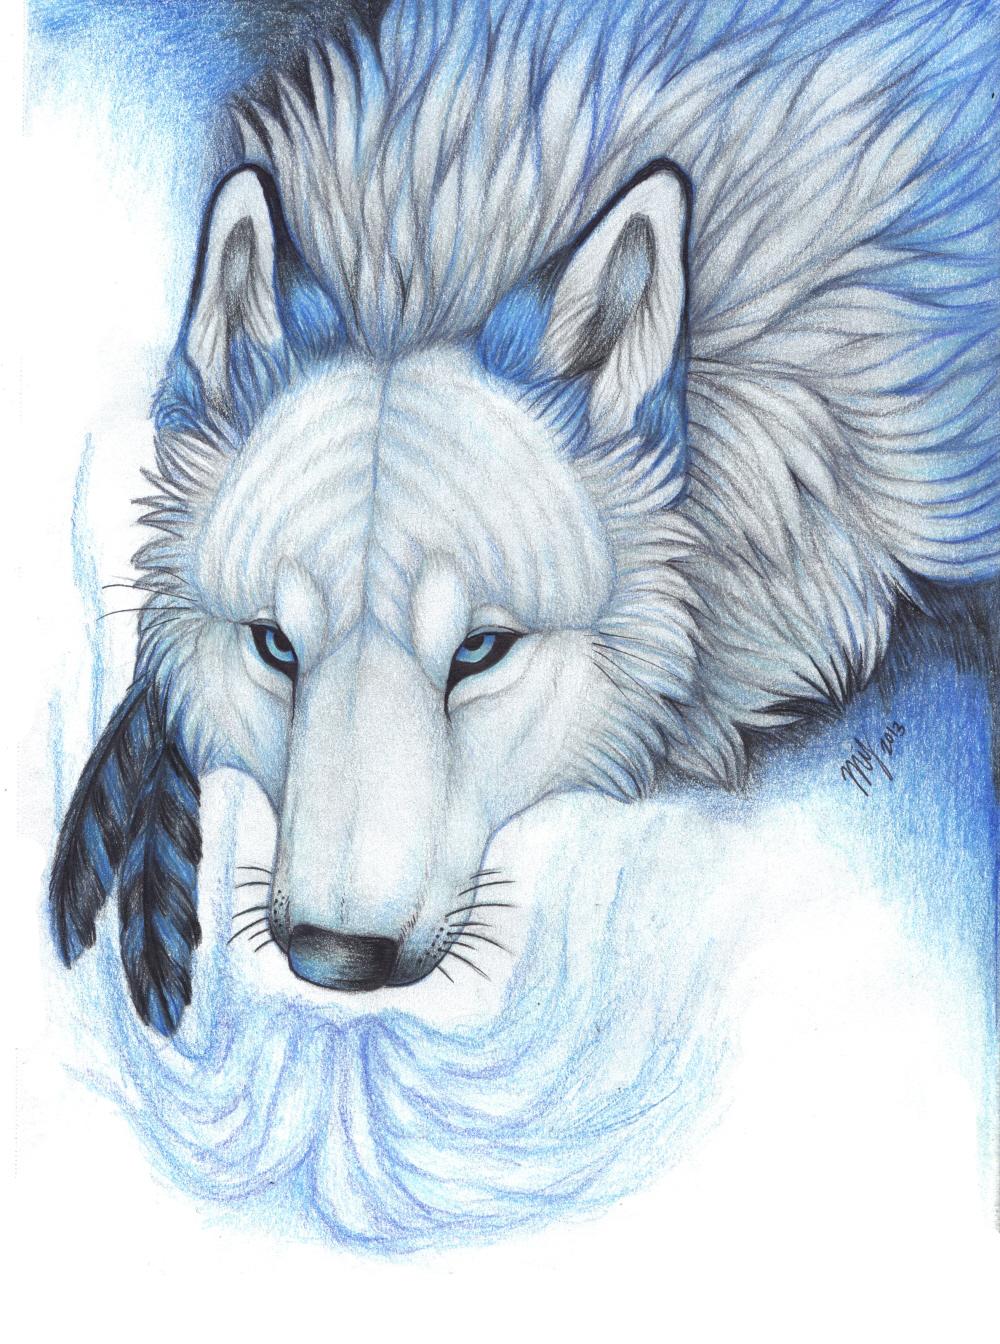 Suenta-DeathGod's Profile Picture